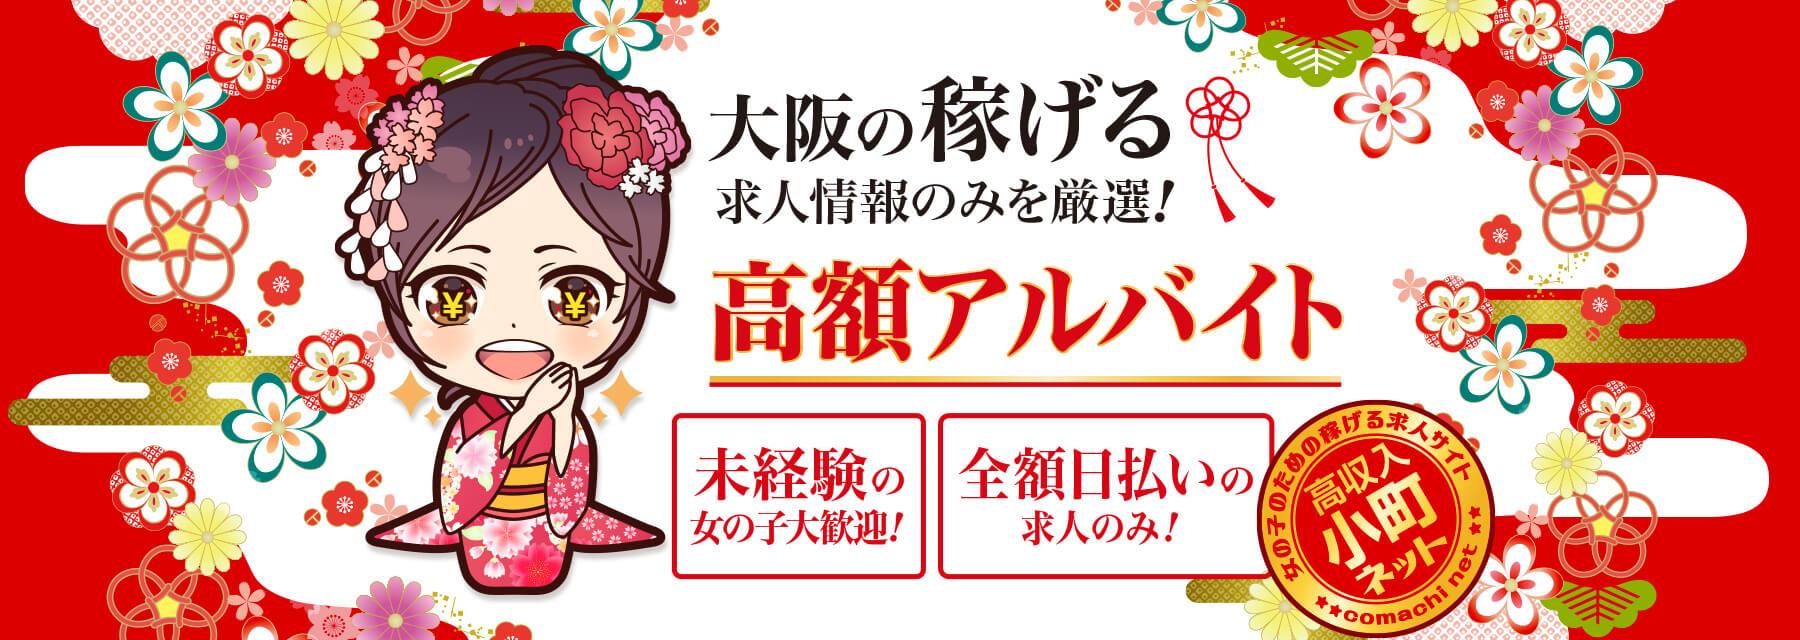 飛田新地・松島新地の求人【小町ネット】